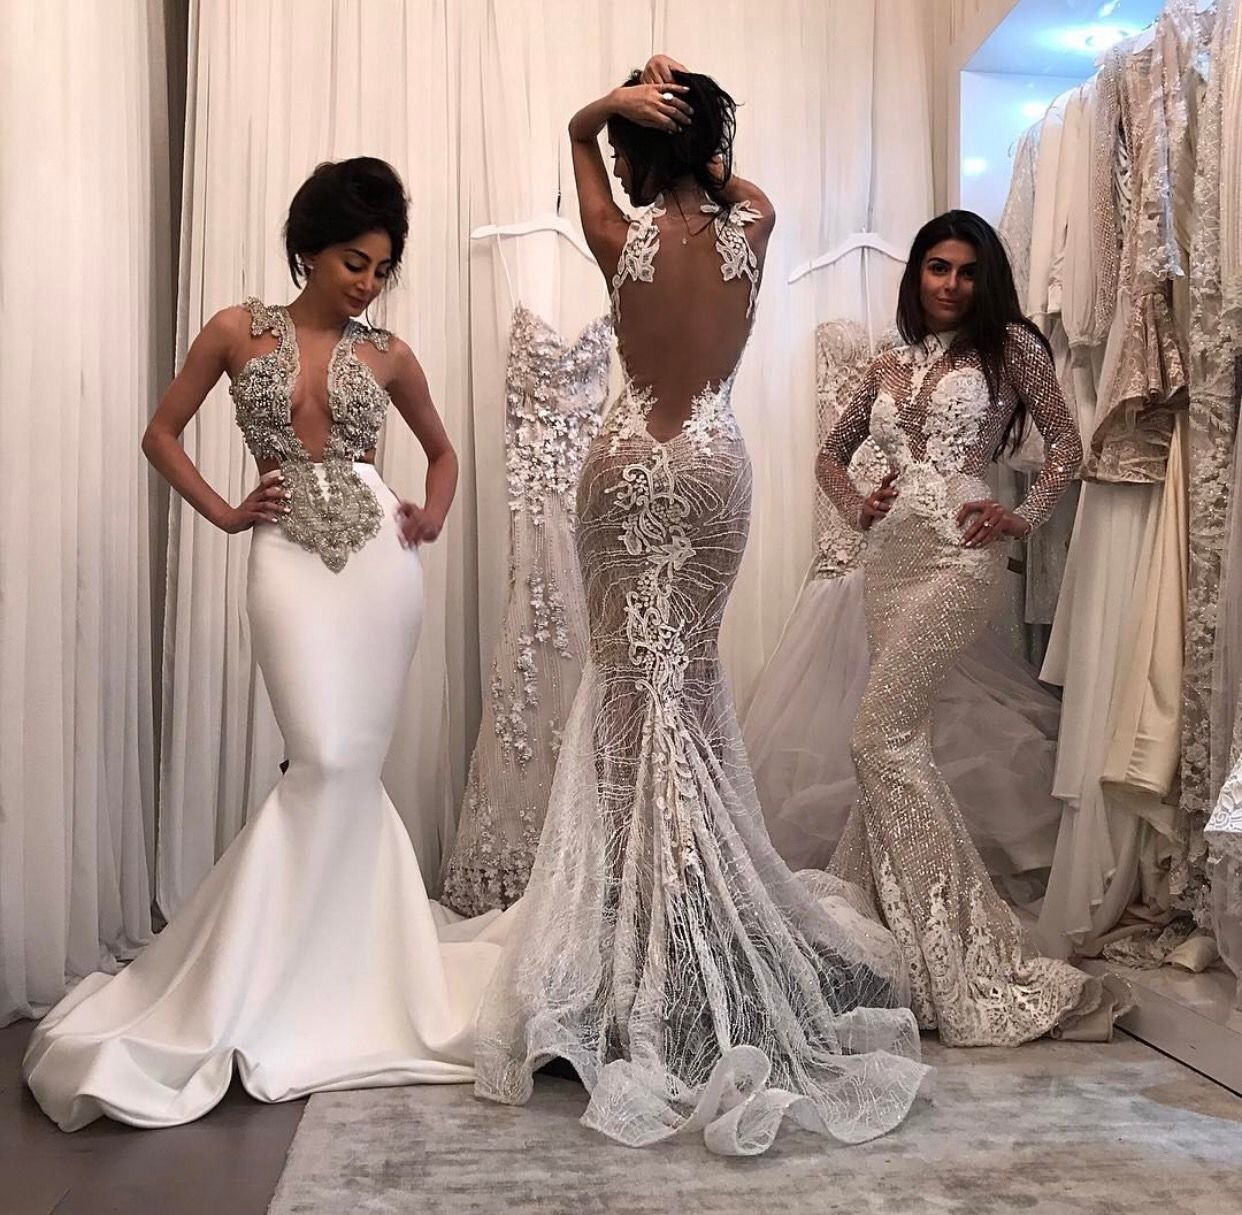 ♛Foam and Diamonds♛ Wedding Queen. Wedding, Wedding